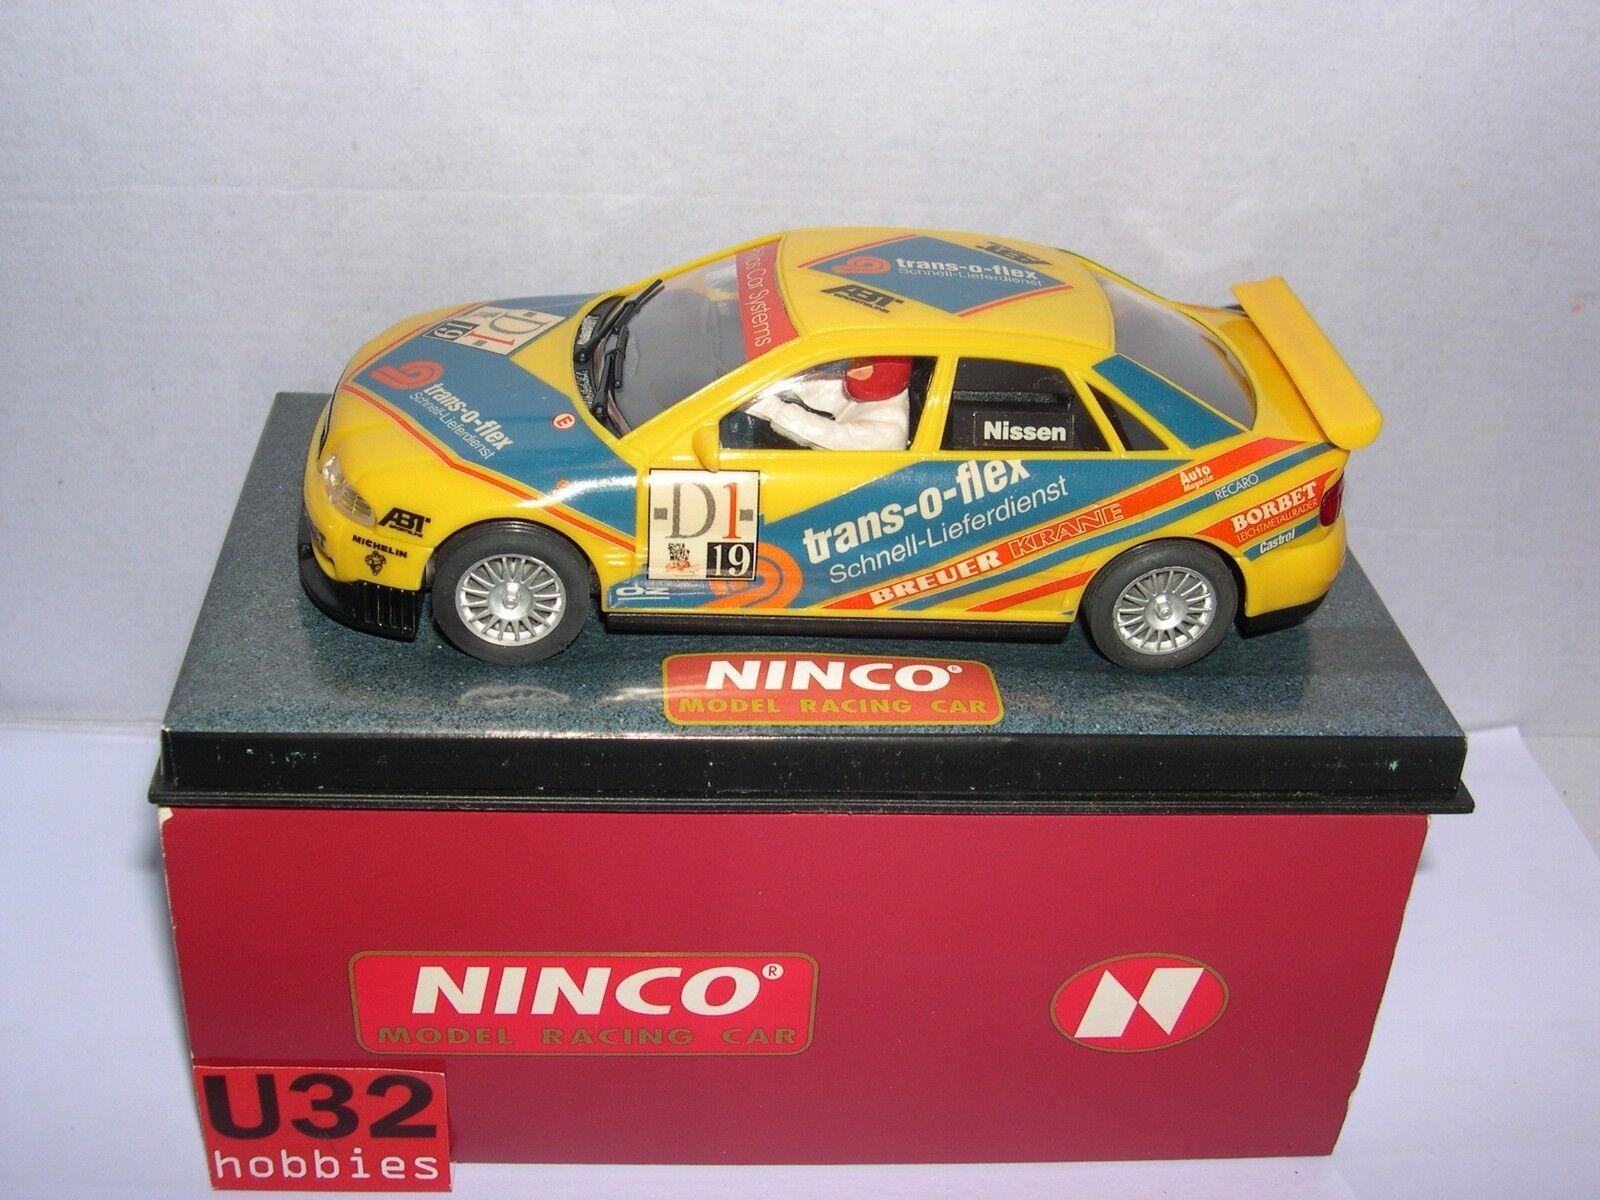 NINCO 50138 AUDI A4  19 ABT NISSEN MB